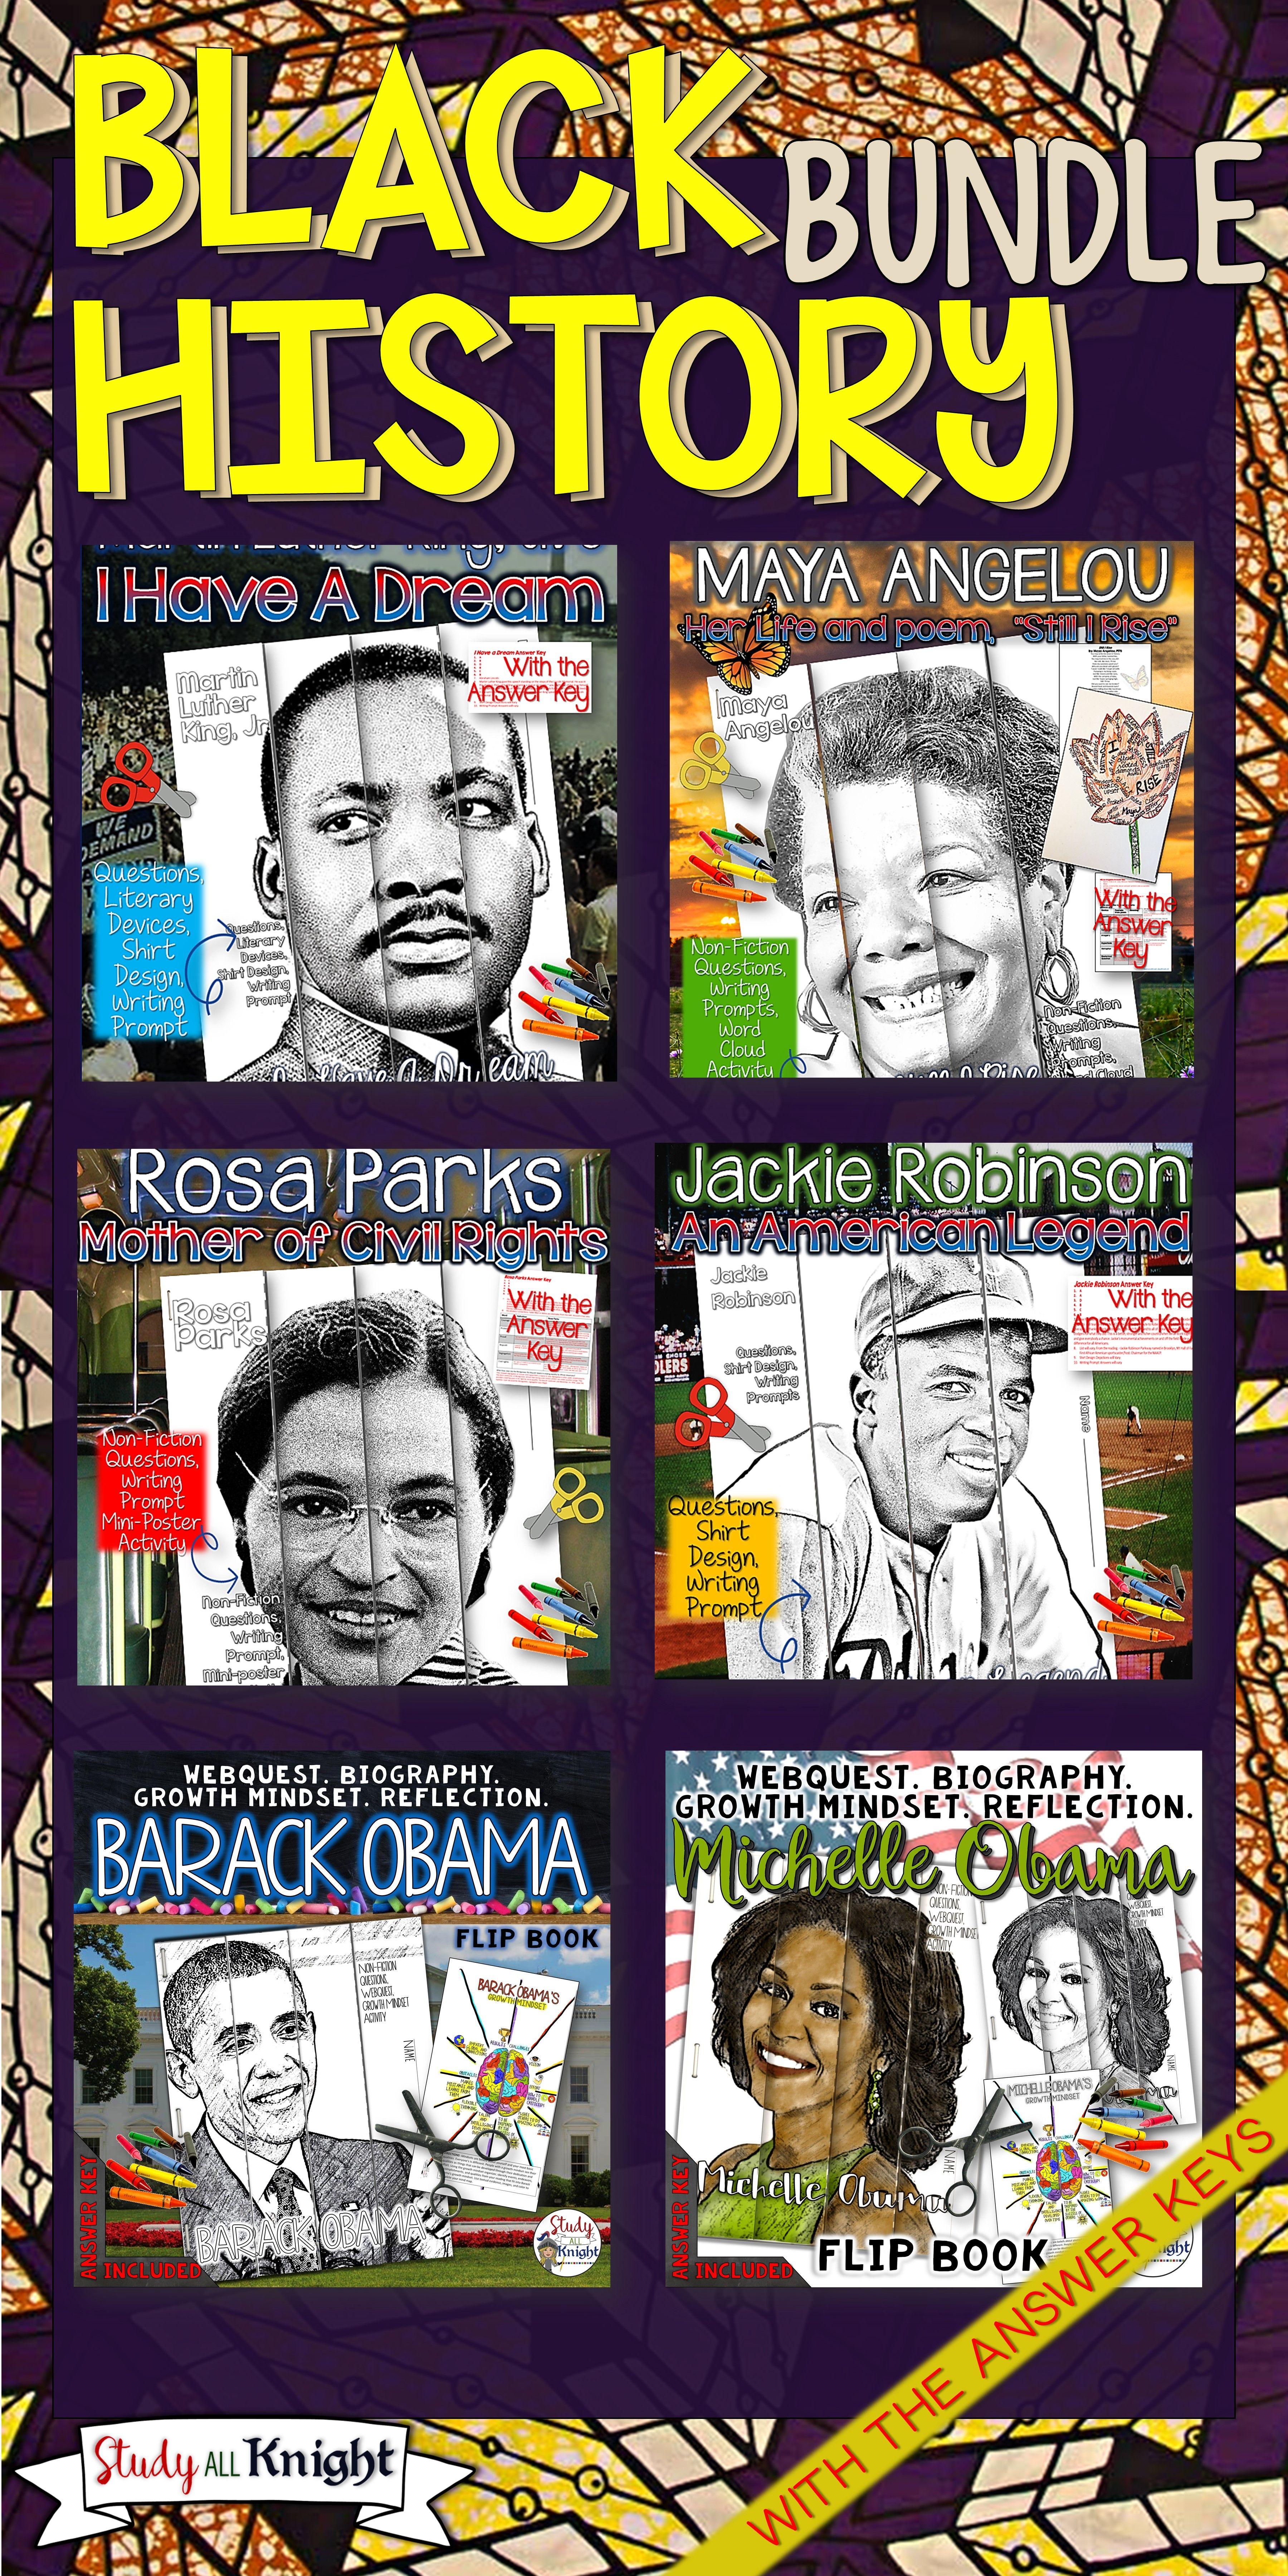 Black History Month Activities Biographies Webquests Growth Mindset Bundle